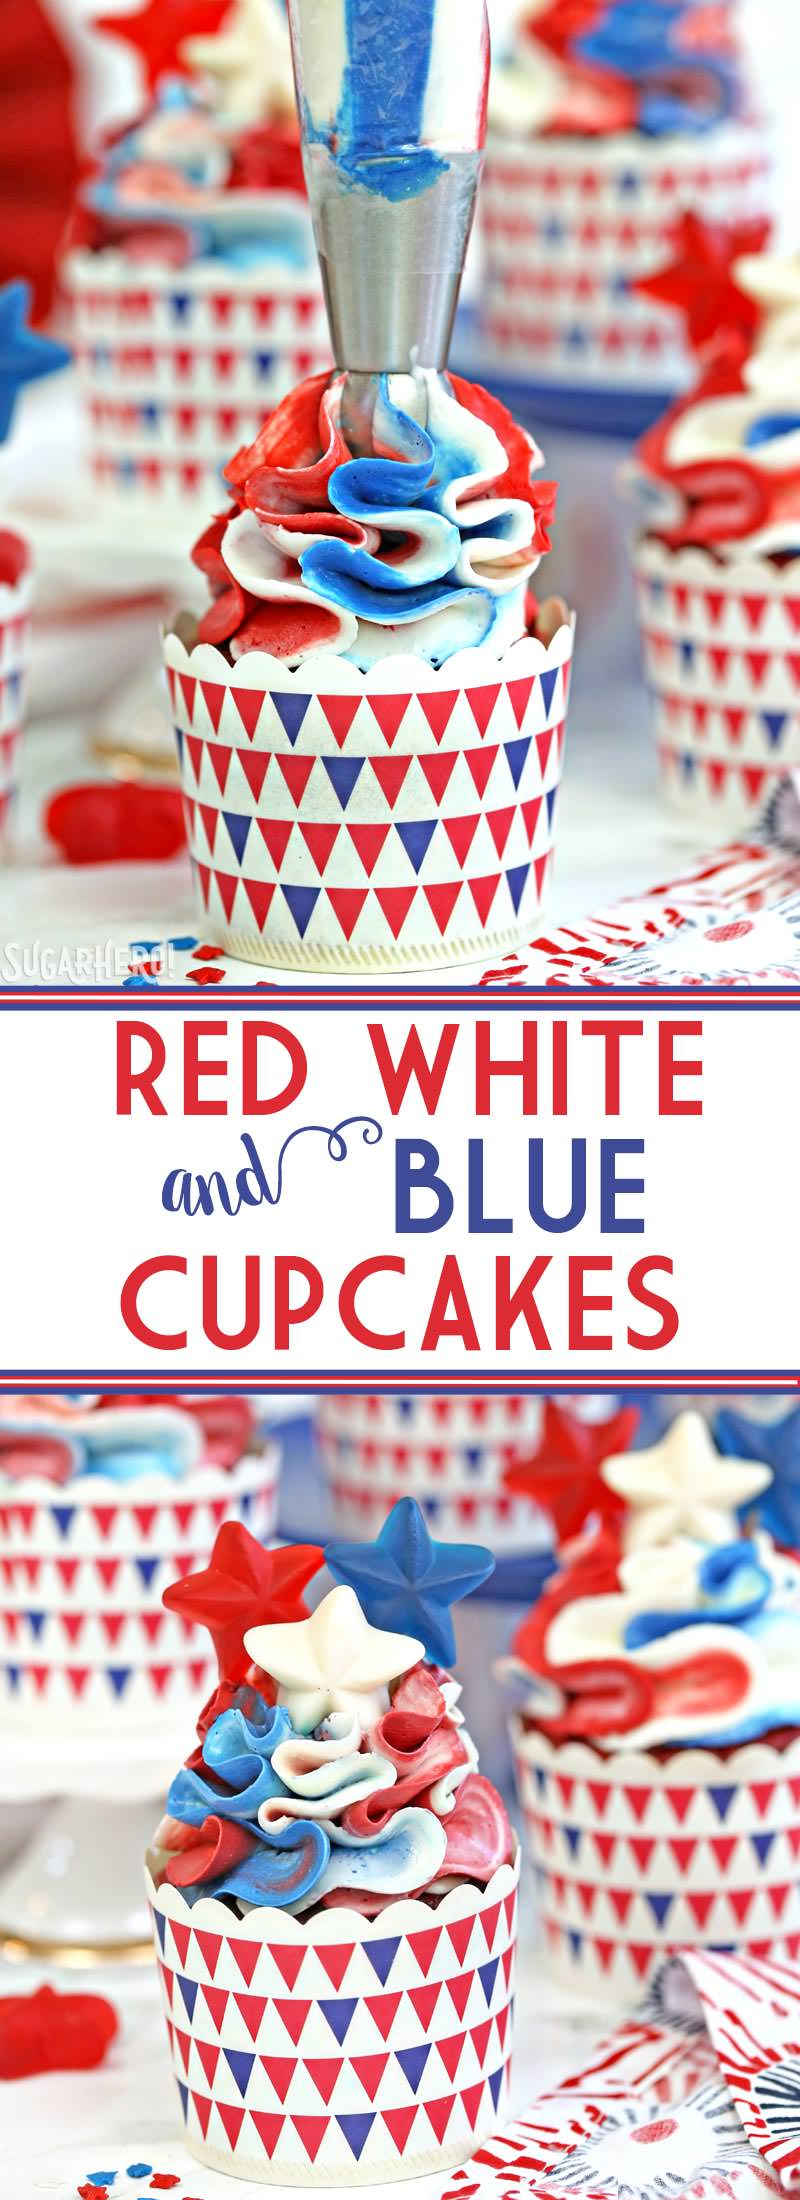 Red White And Blue Cupcakes Sugarhero